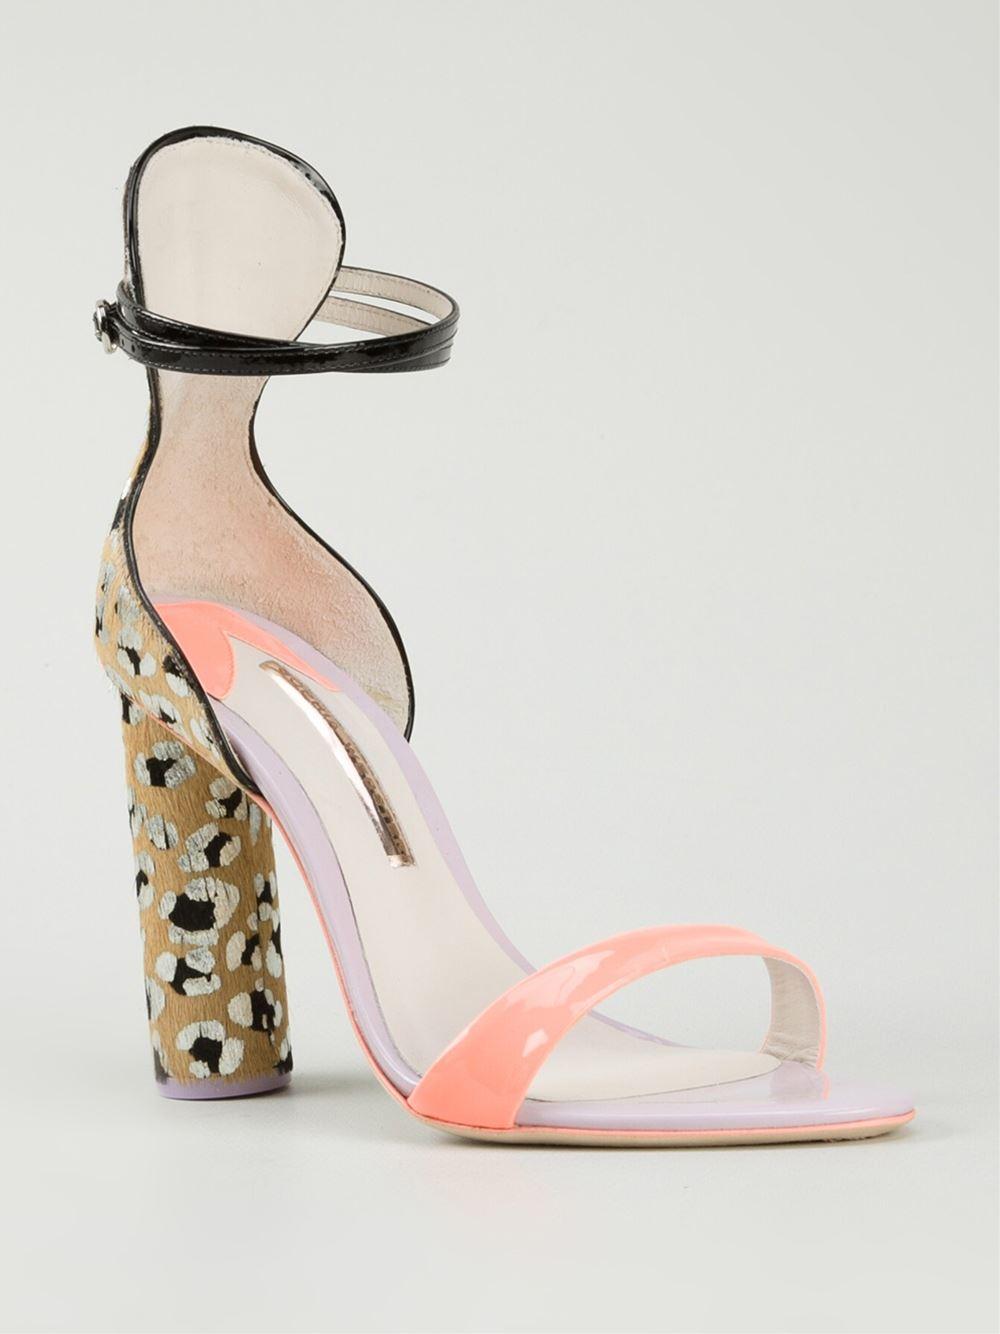 Sophia webster 'nicole' sandals